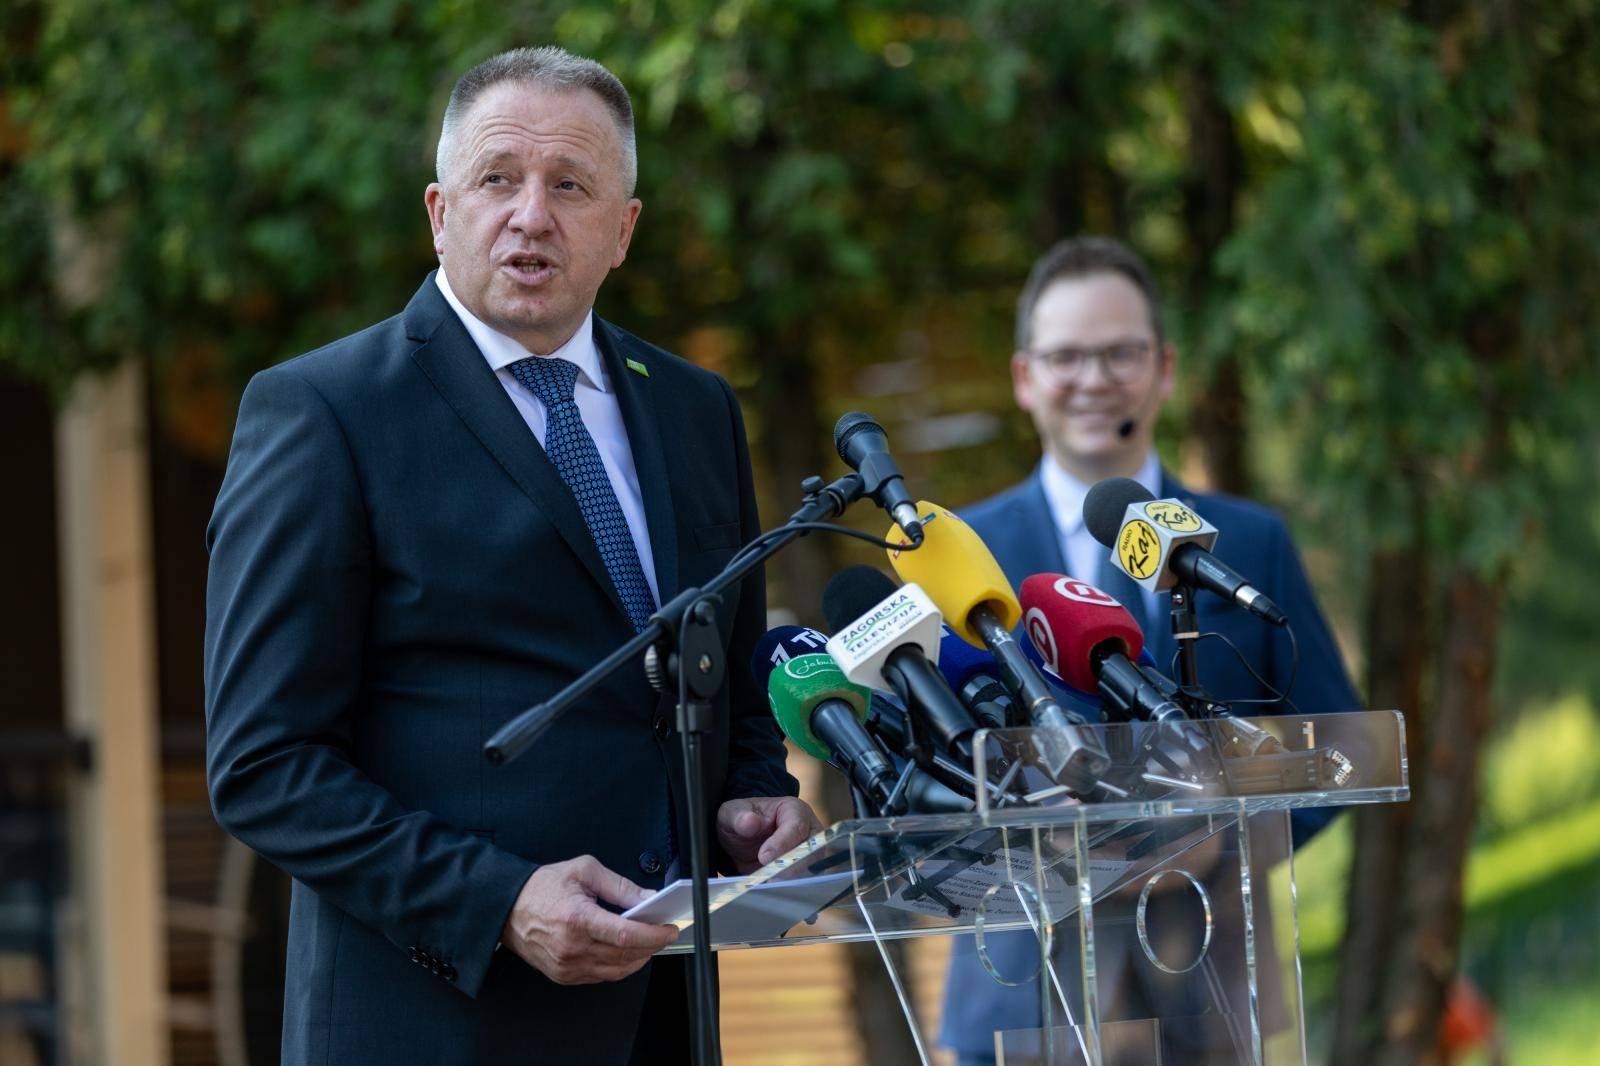 Predsjednik Zoran Milanović sudjelovao na službenom otvaranju Glamping villagea Termi Tuhelj